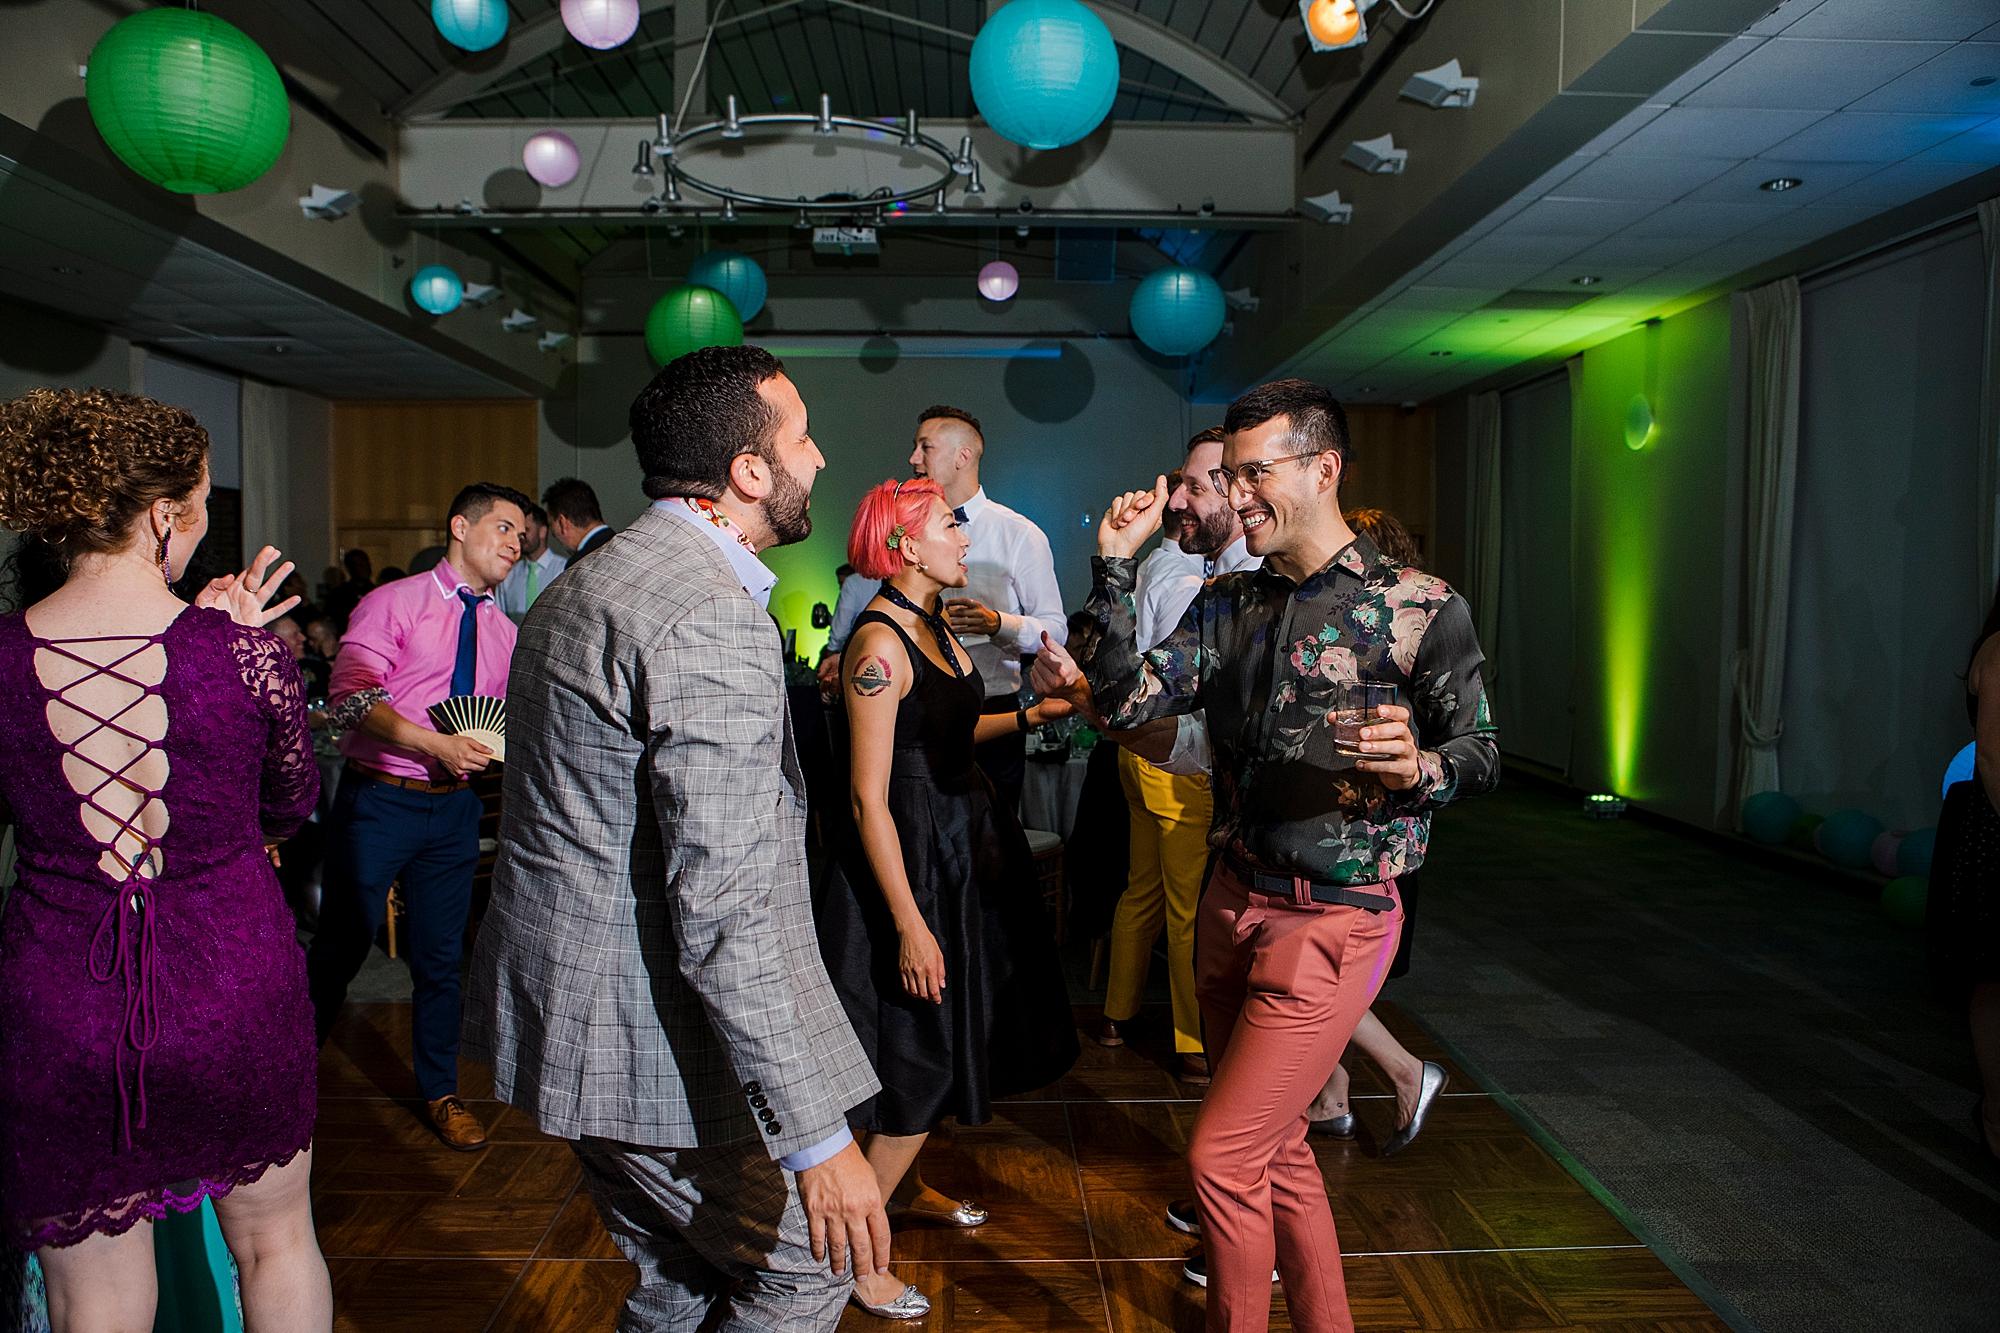 Dan_and_Byron_Love_by_Joe_Mac_Philadelphia_Wedding_LGBTQ_Photography_Gay_Independence_visitor_Center_147.JPG